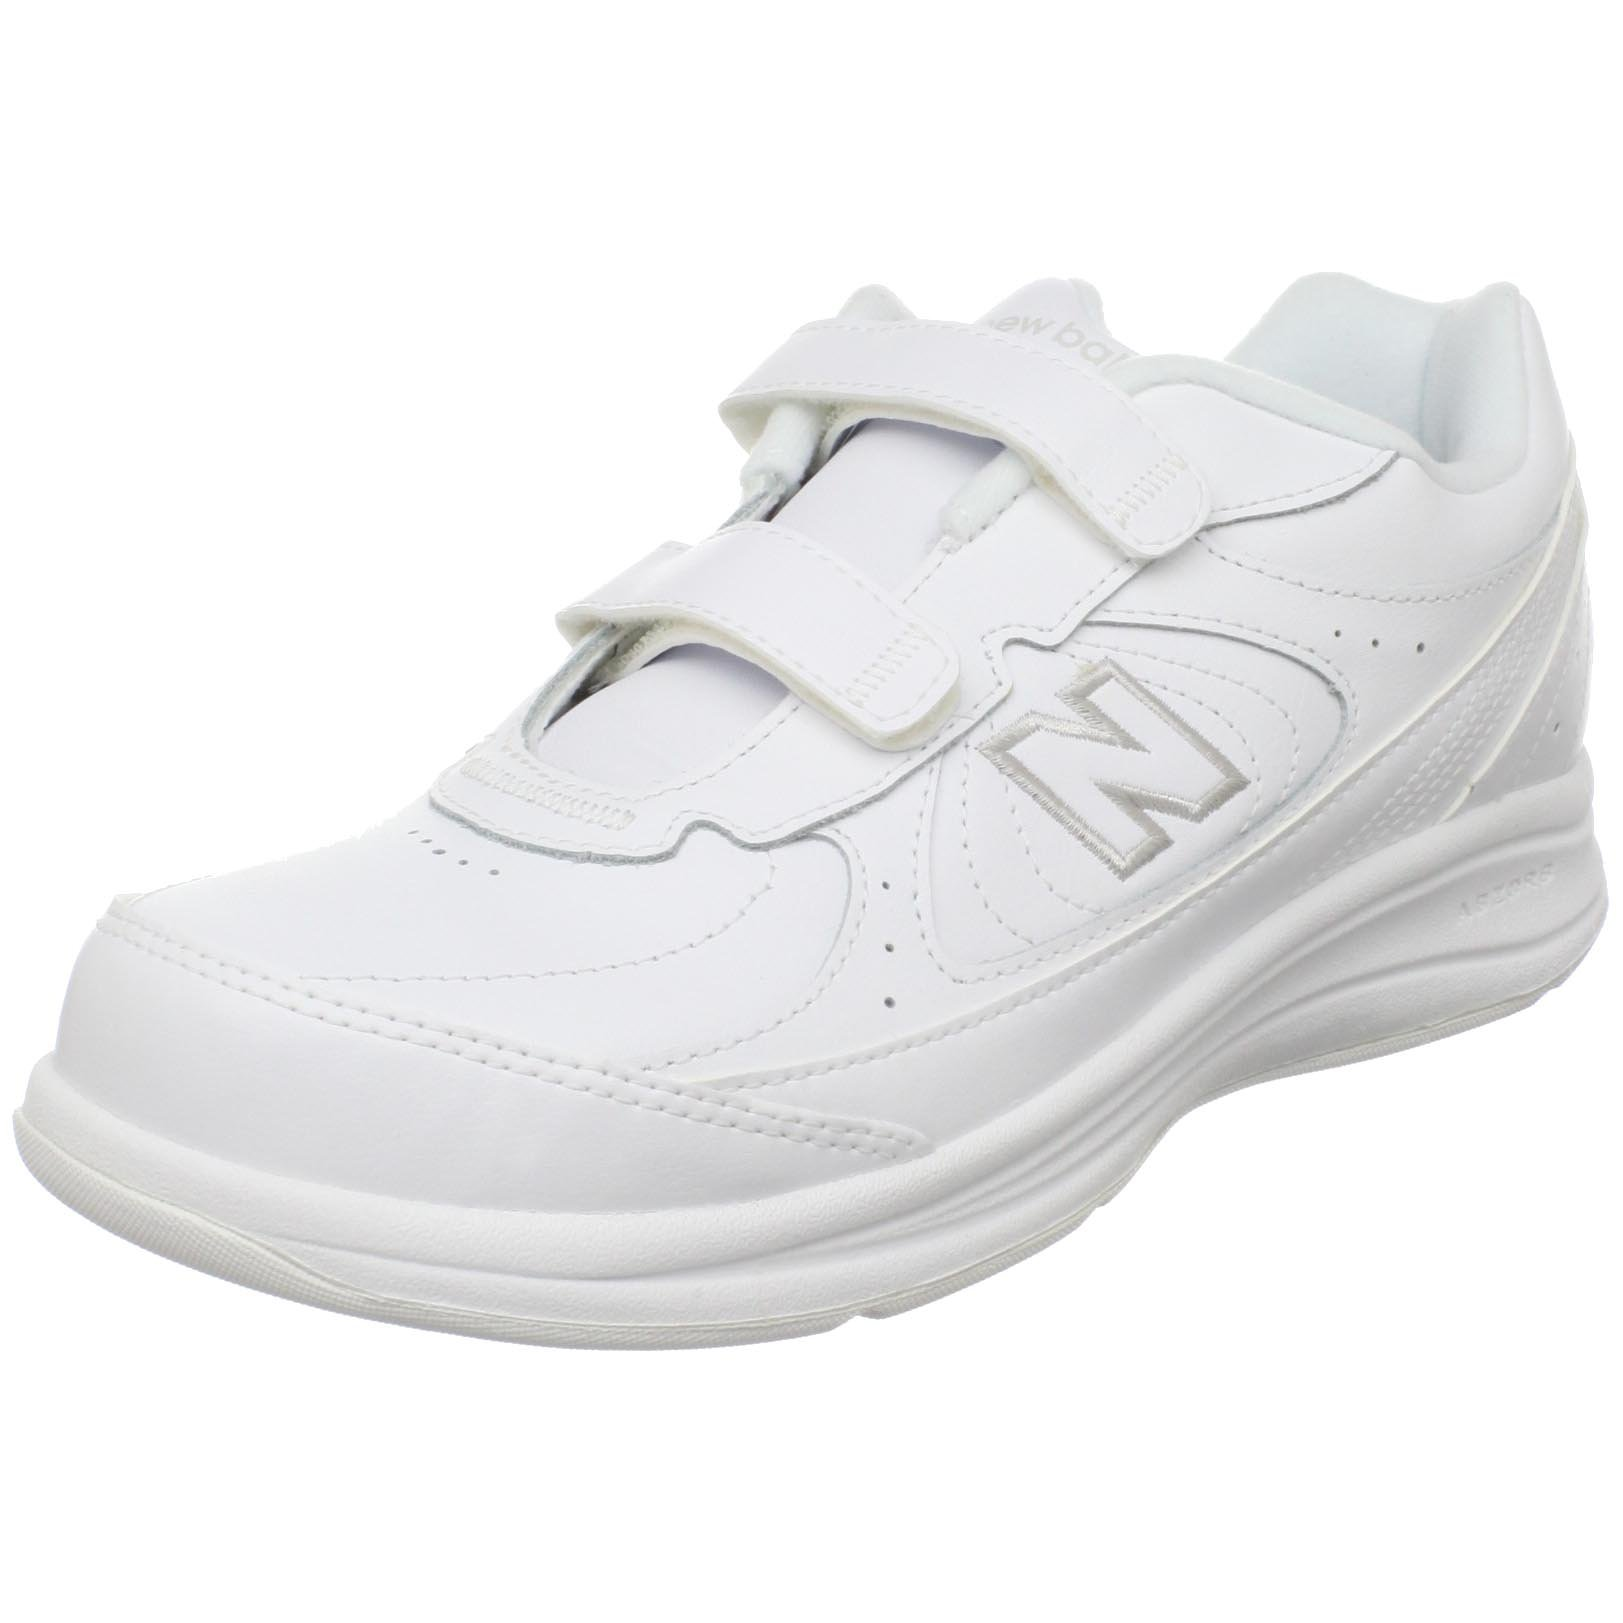 ''New Balance Women's WW577 Walking Velcro Shoe,White,8 D US'' by New Balance